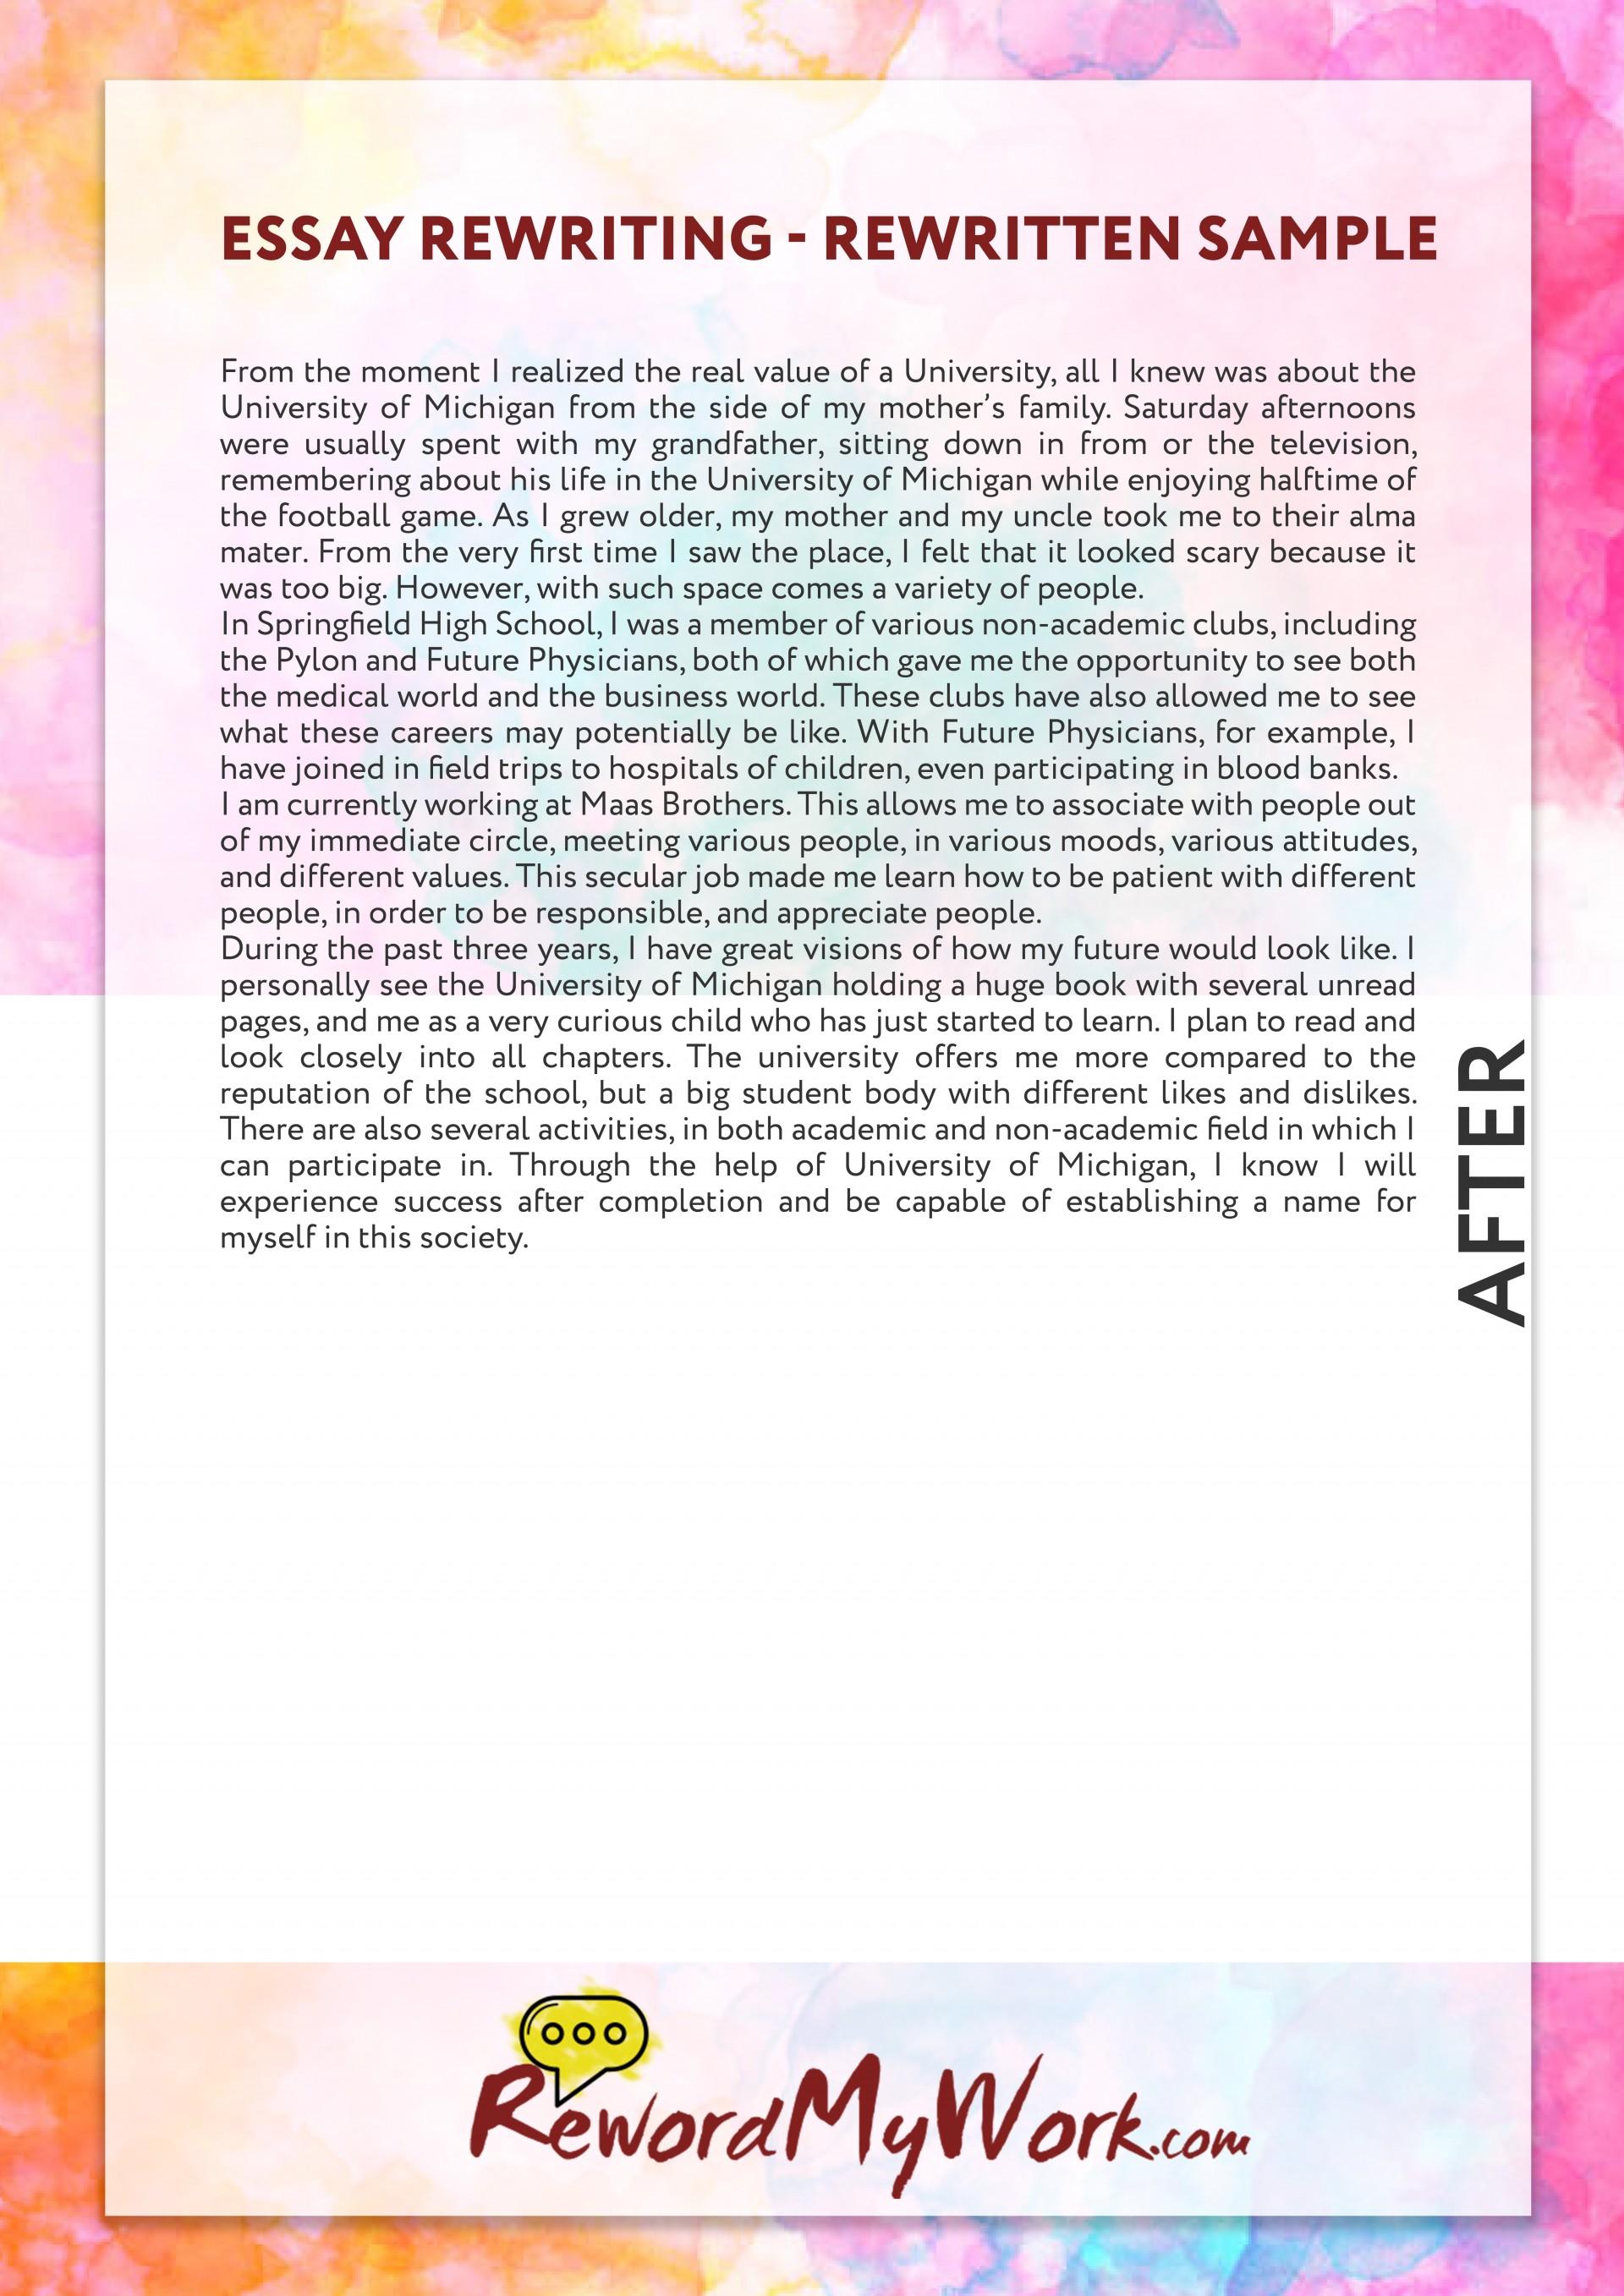 003 Reword Essay Example Amazing Generator Free 1920